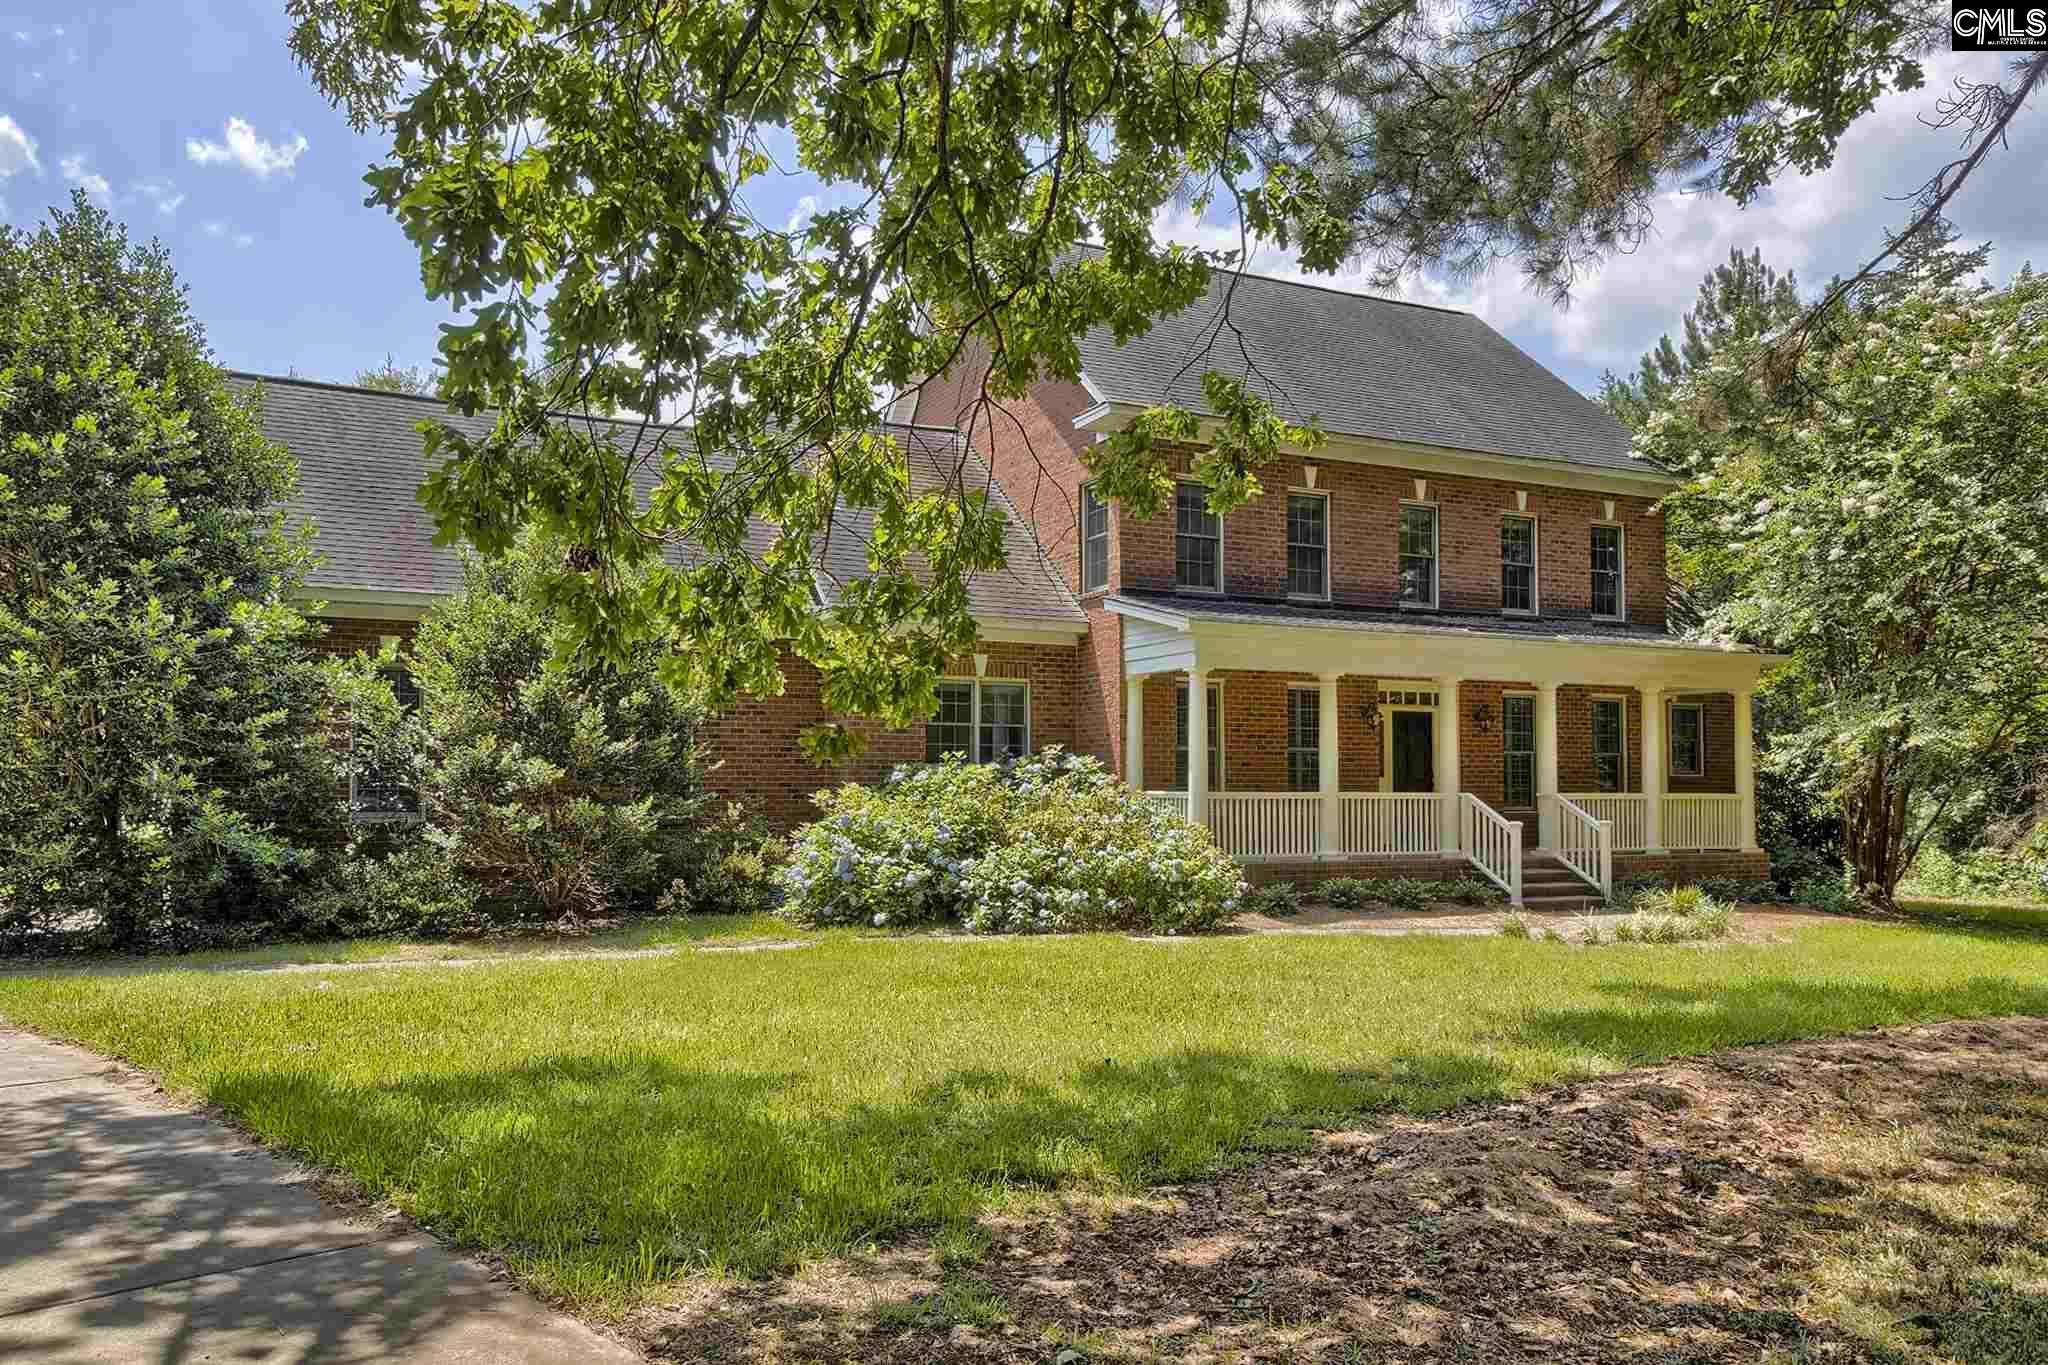 109 South Webb Hopkins, SC 29061